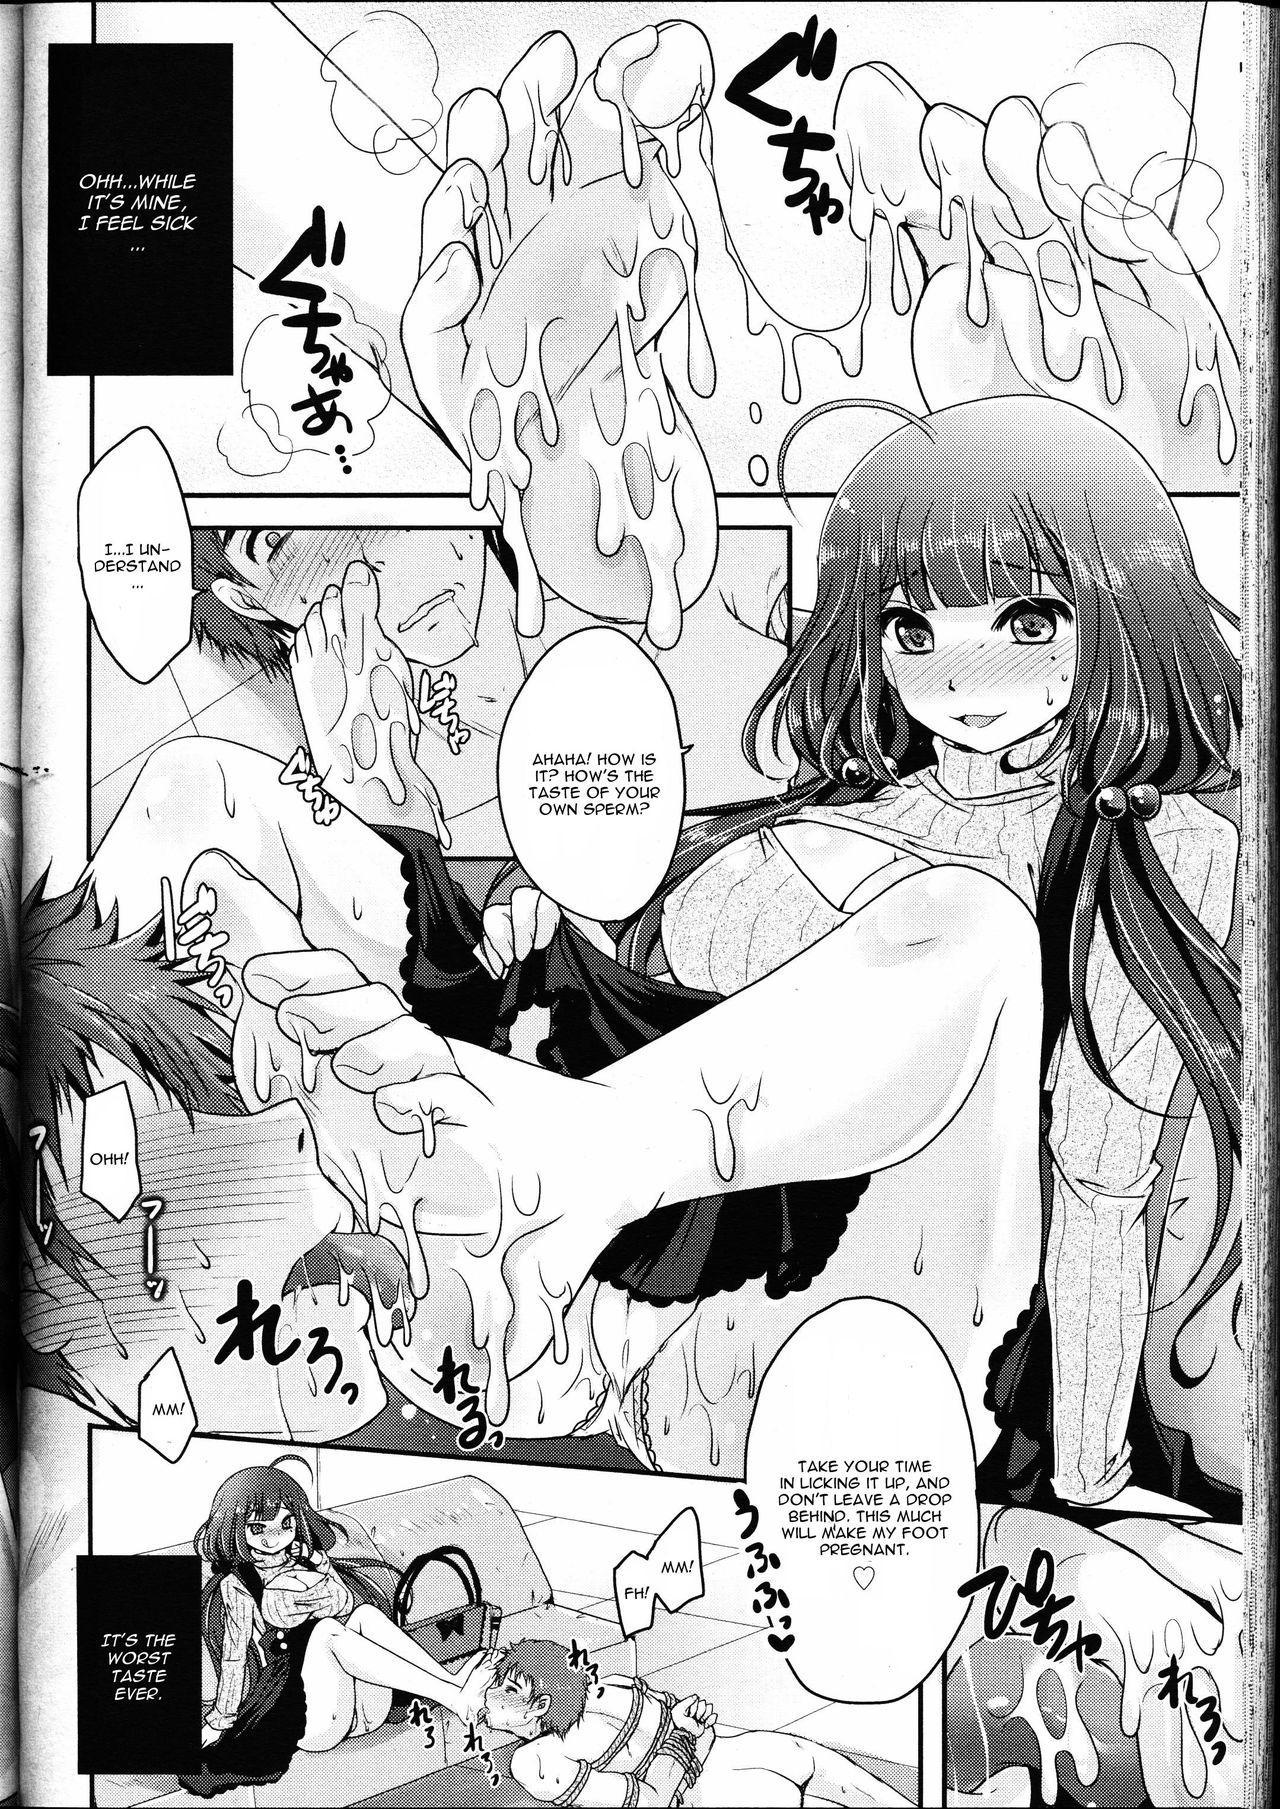 [Usubeni Sakurako] Henshuu-san to Eromangaka-chan (Girls forM Vol. 12) [English] [CGrascal] 9